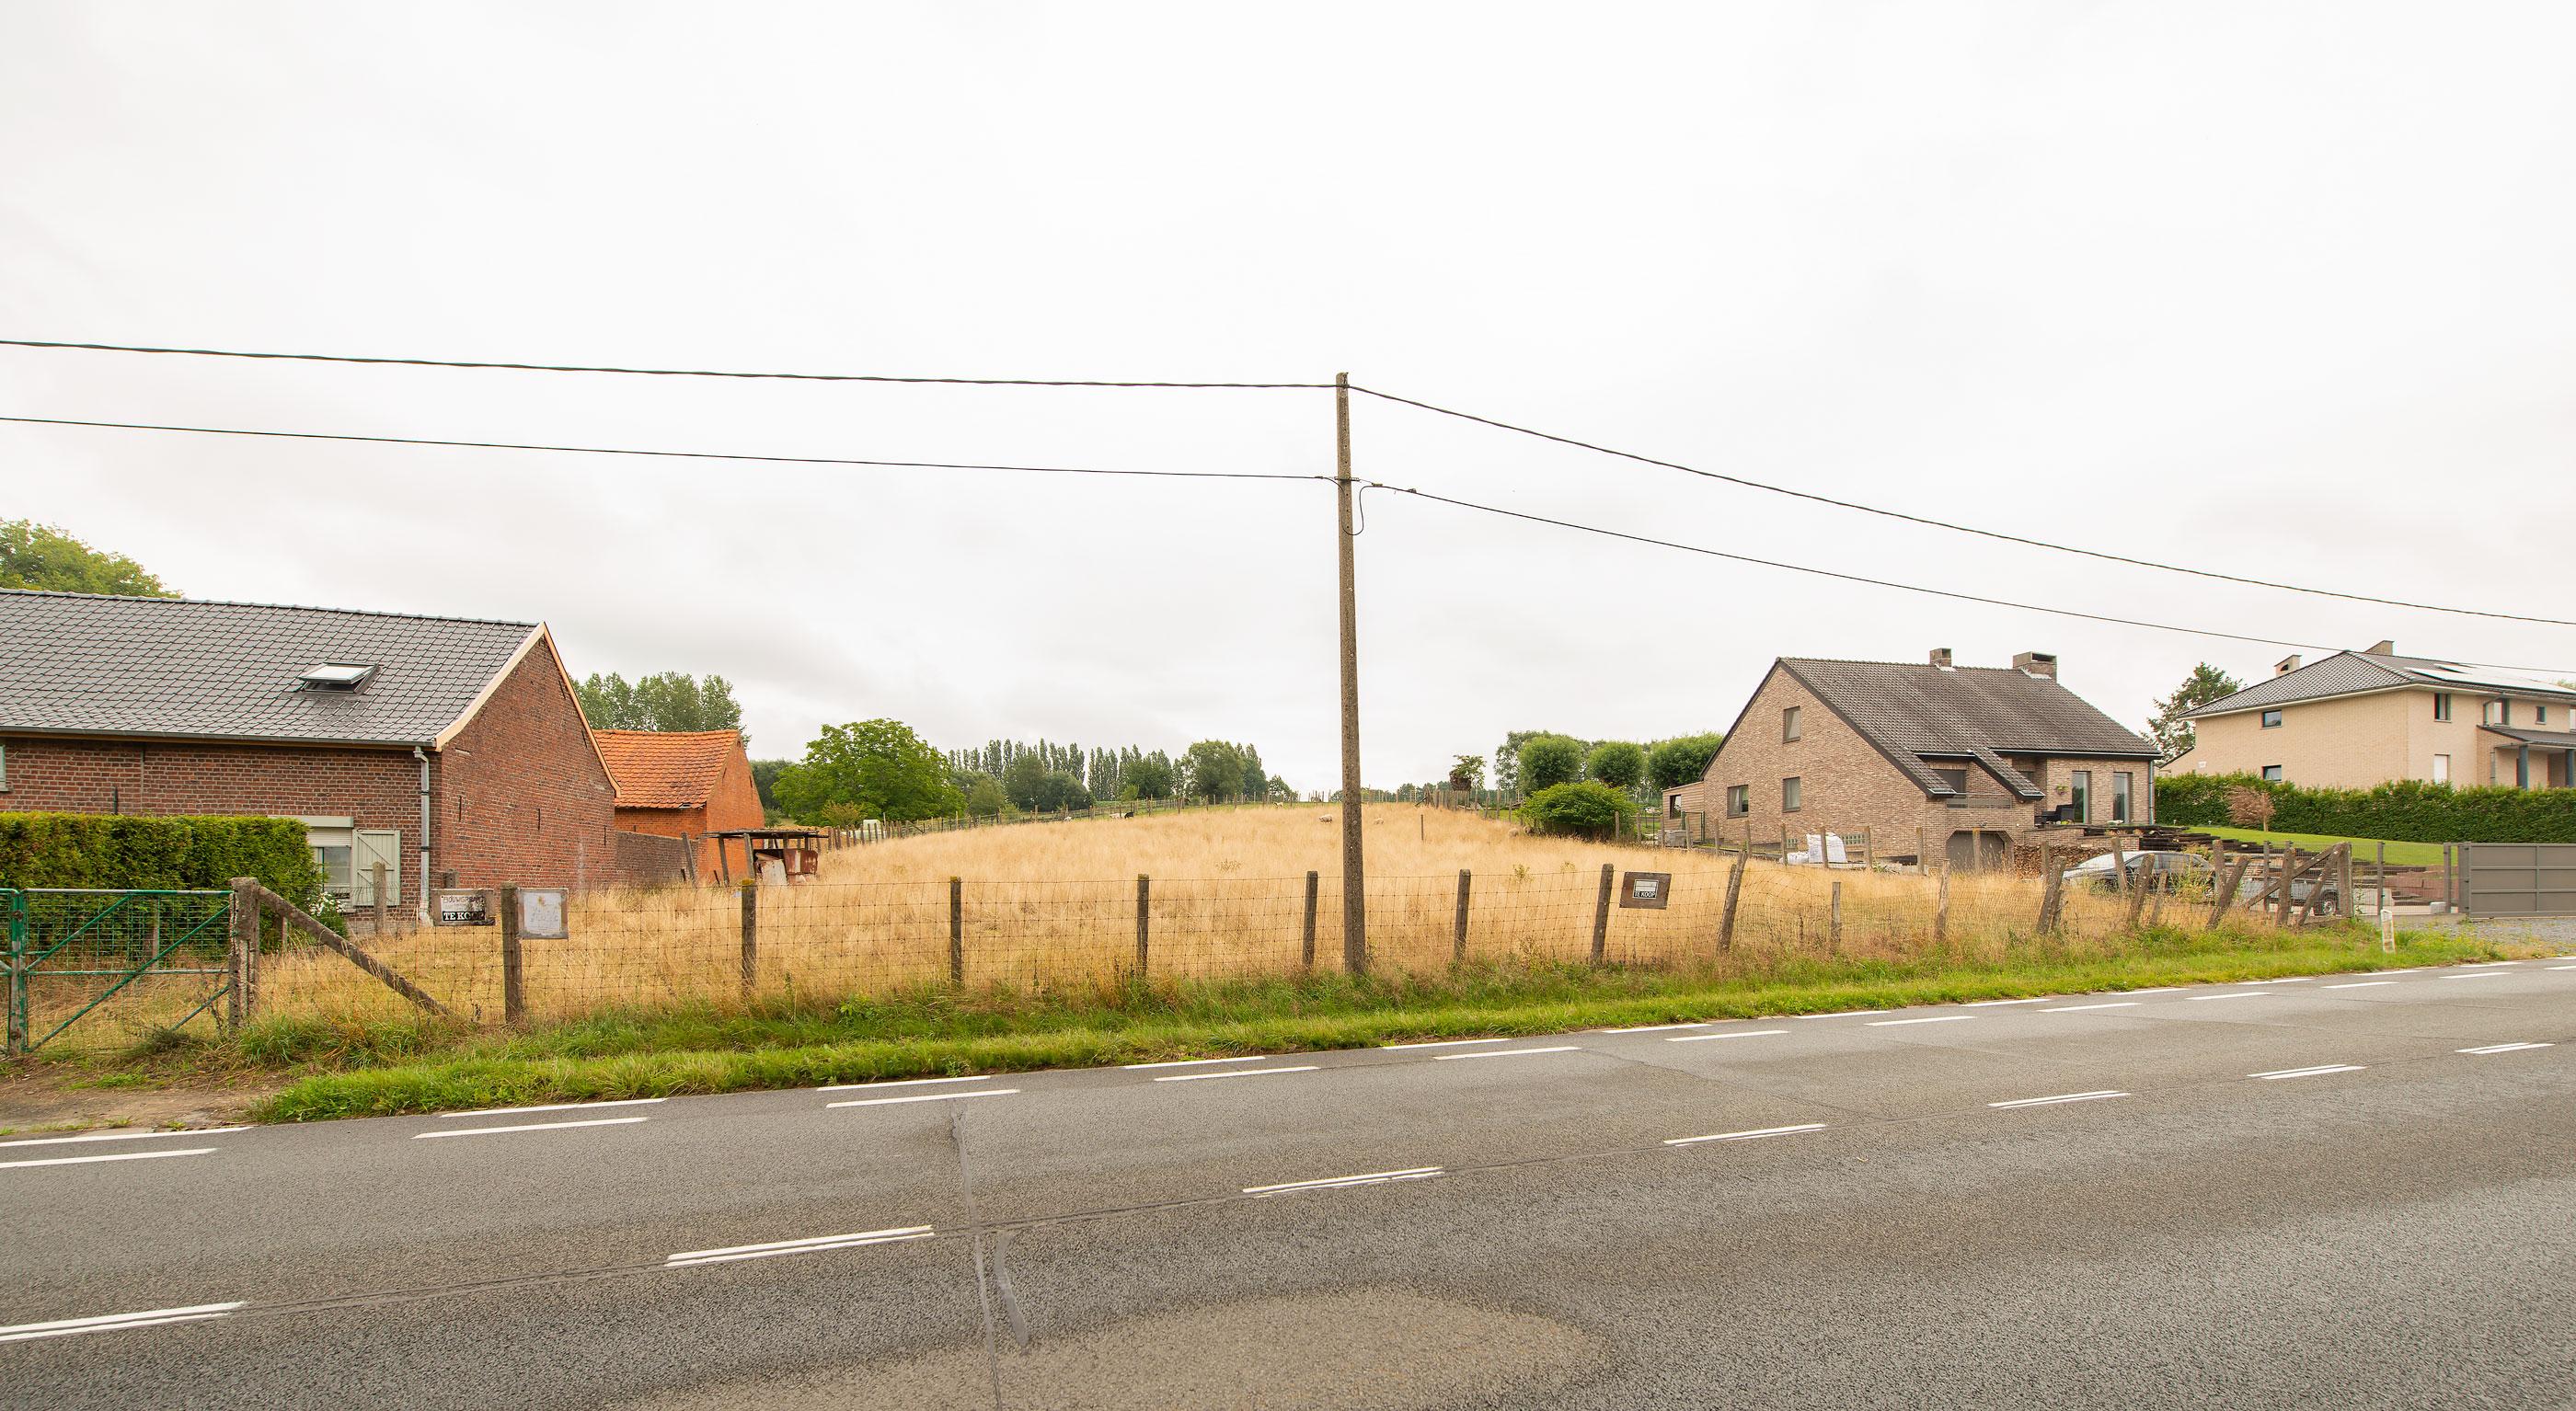 Edingsesteenweg entre numéros 25-27, 1540 Herne